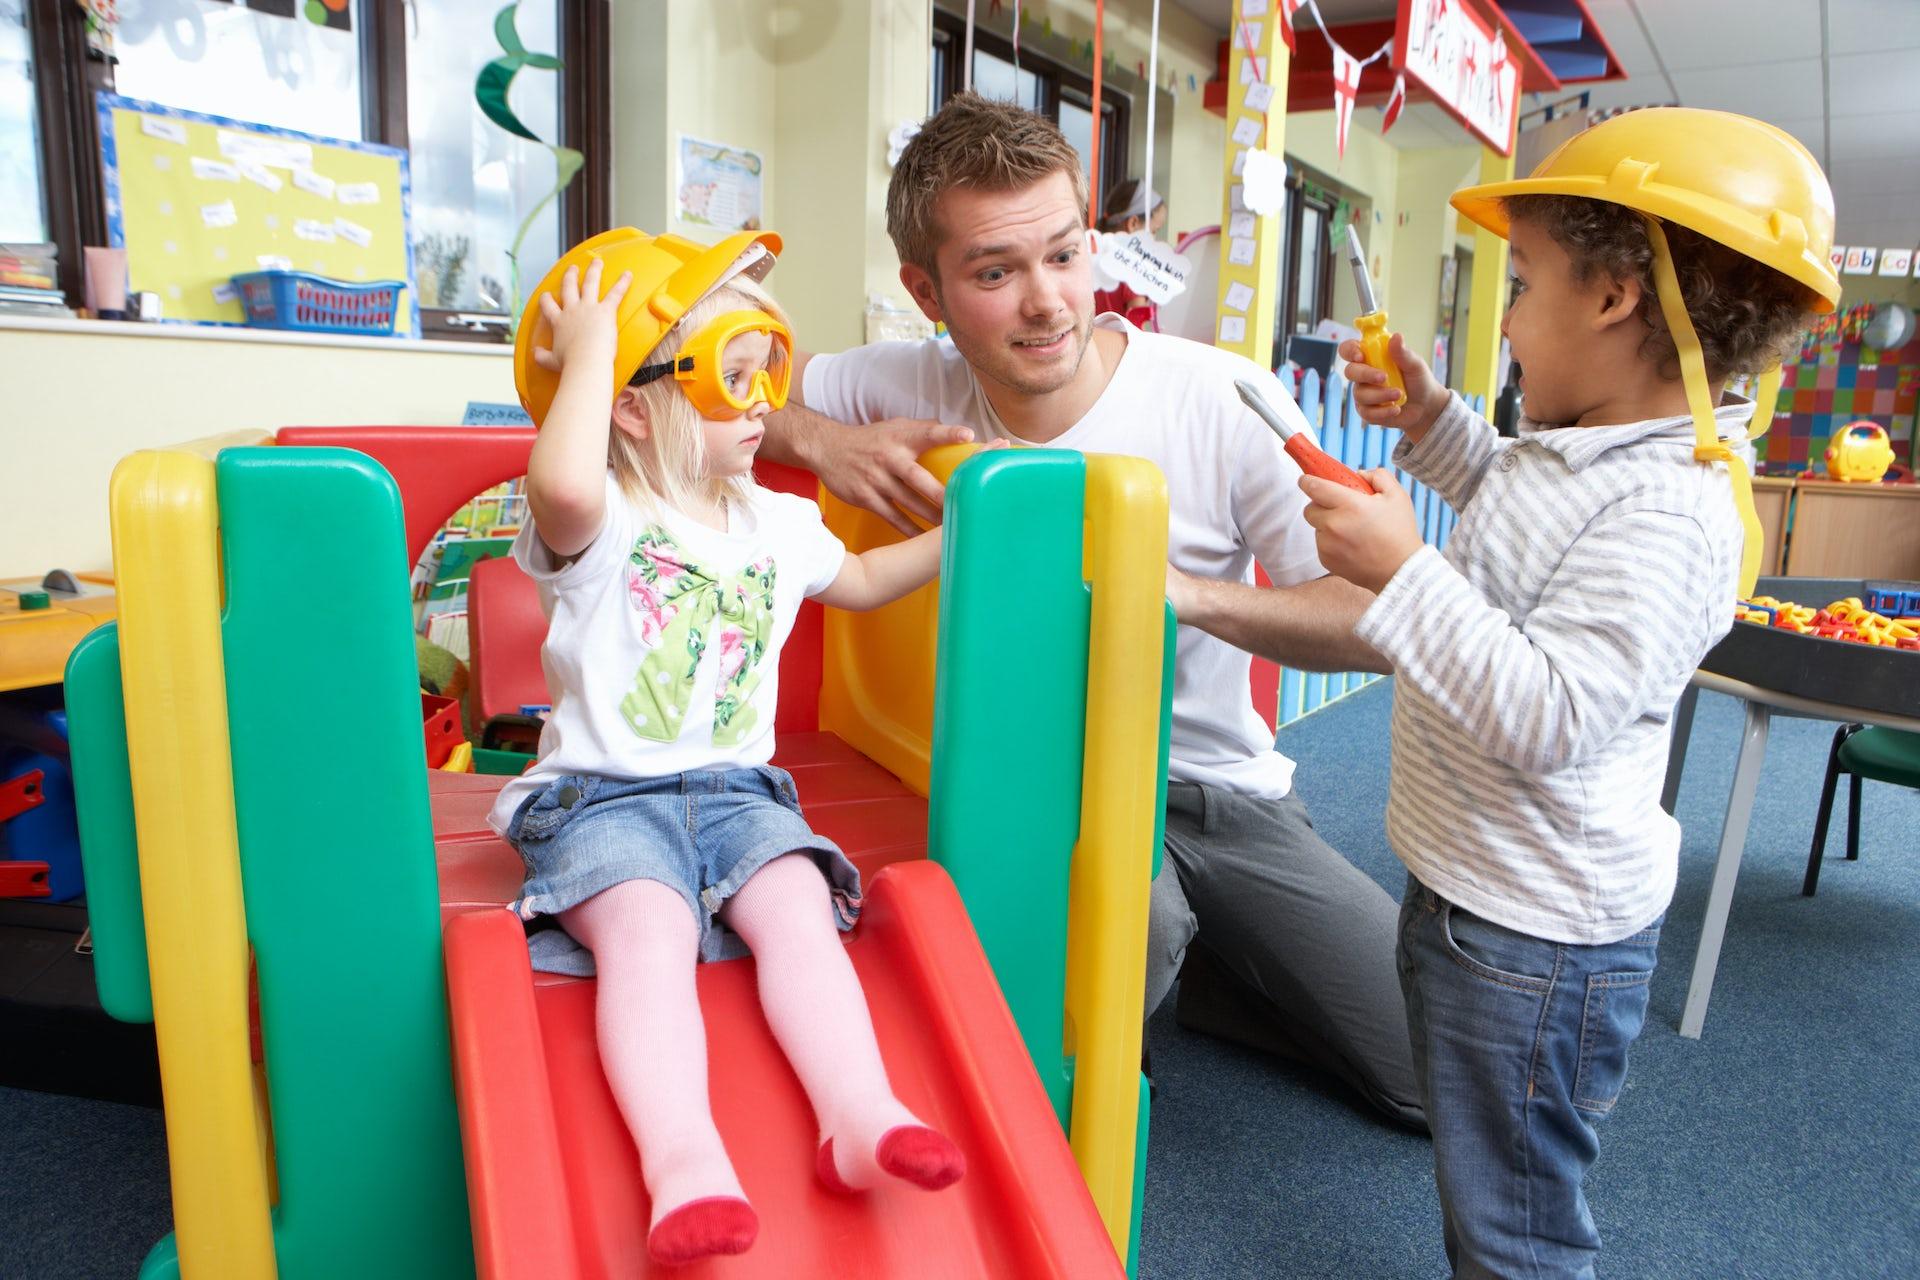 Gender education of children of preschool age